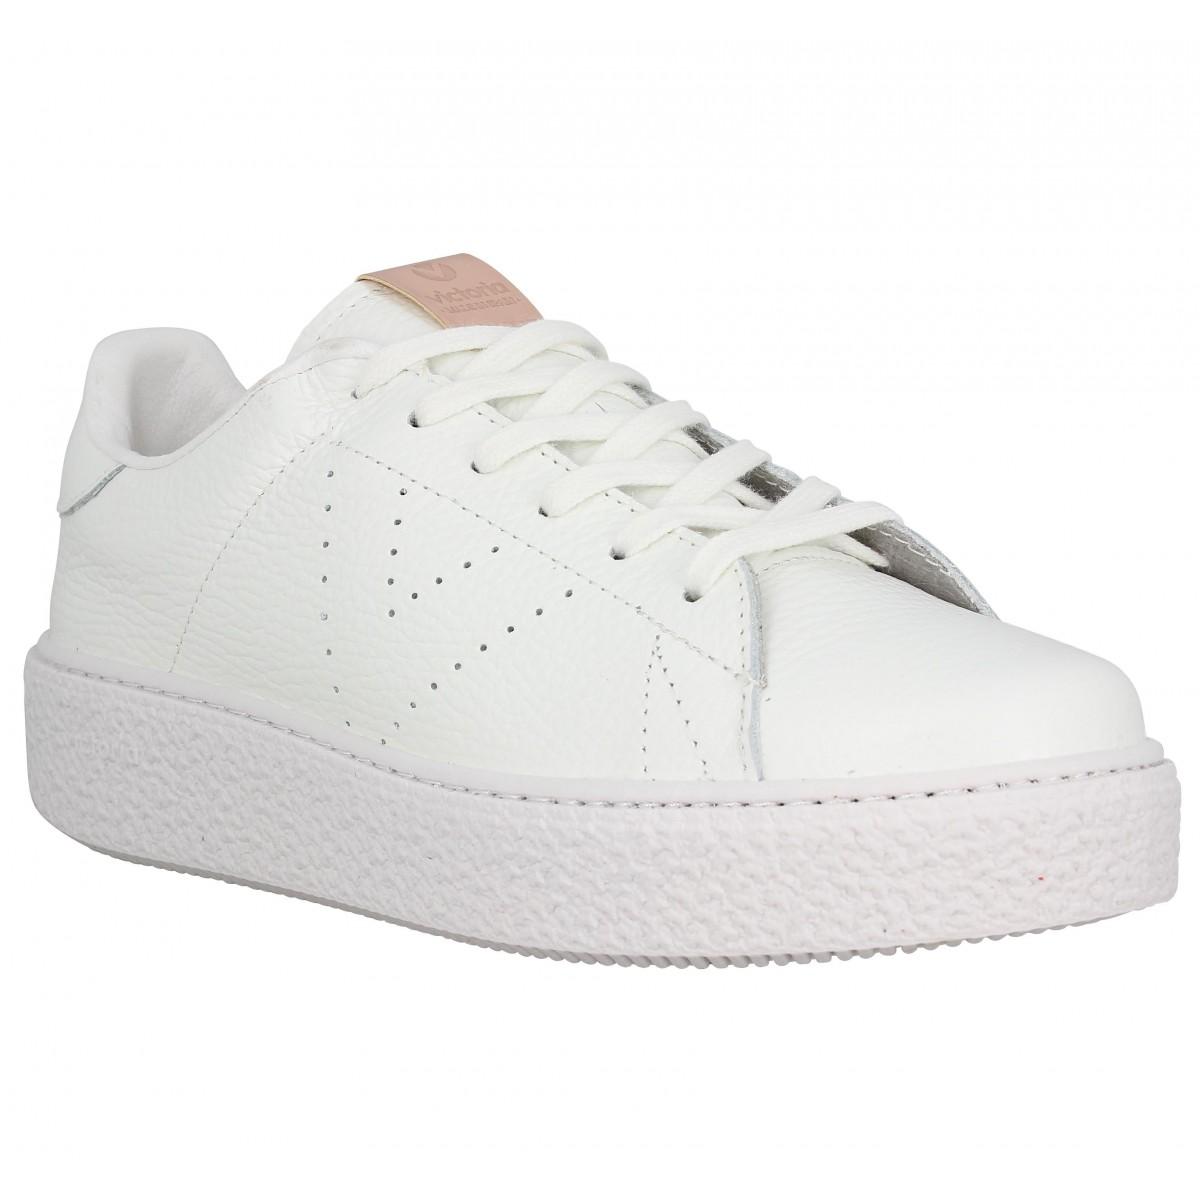 Basket Blanche Cuir Femme : chaussures victoria femme blanche ~ Pogadajmy.info Styles, Décorations et Voitures